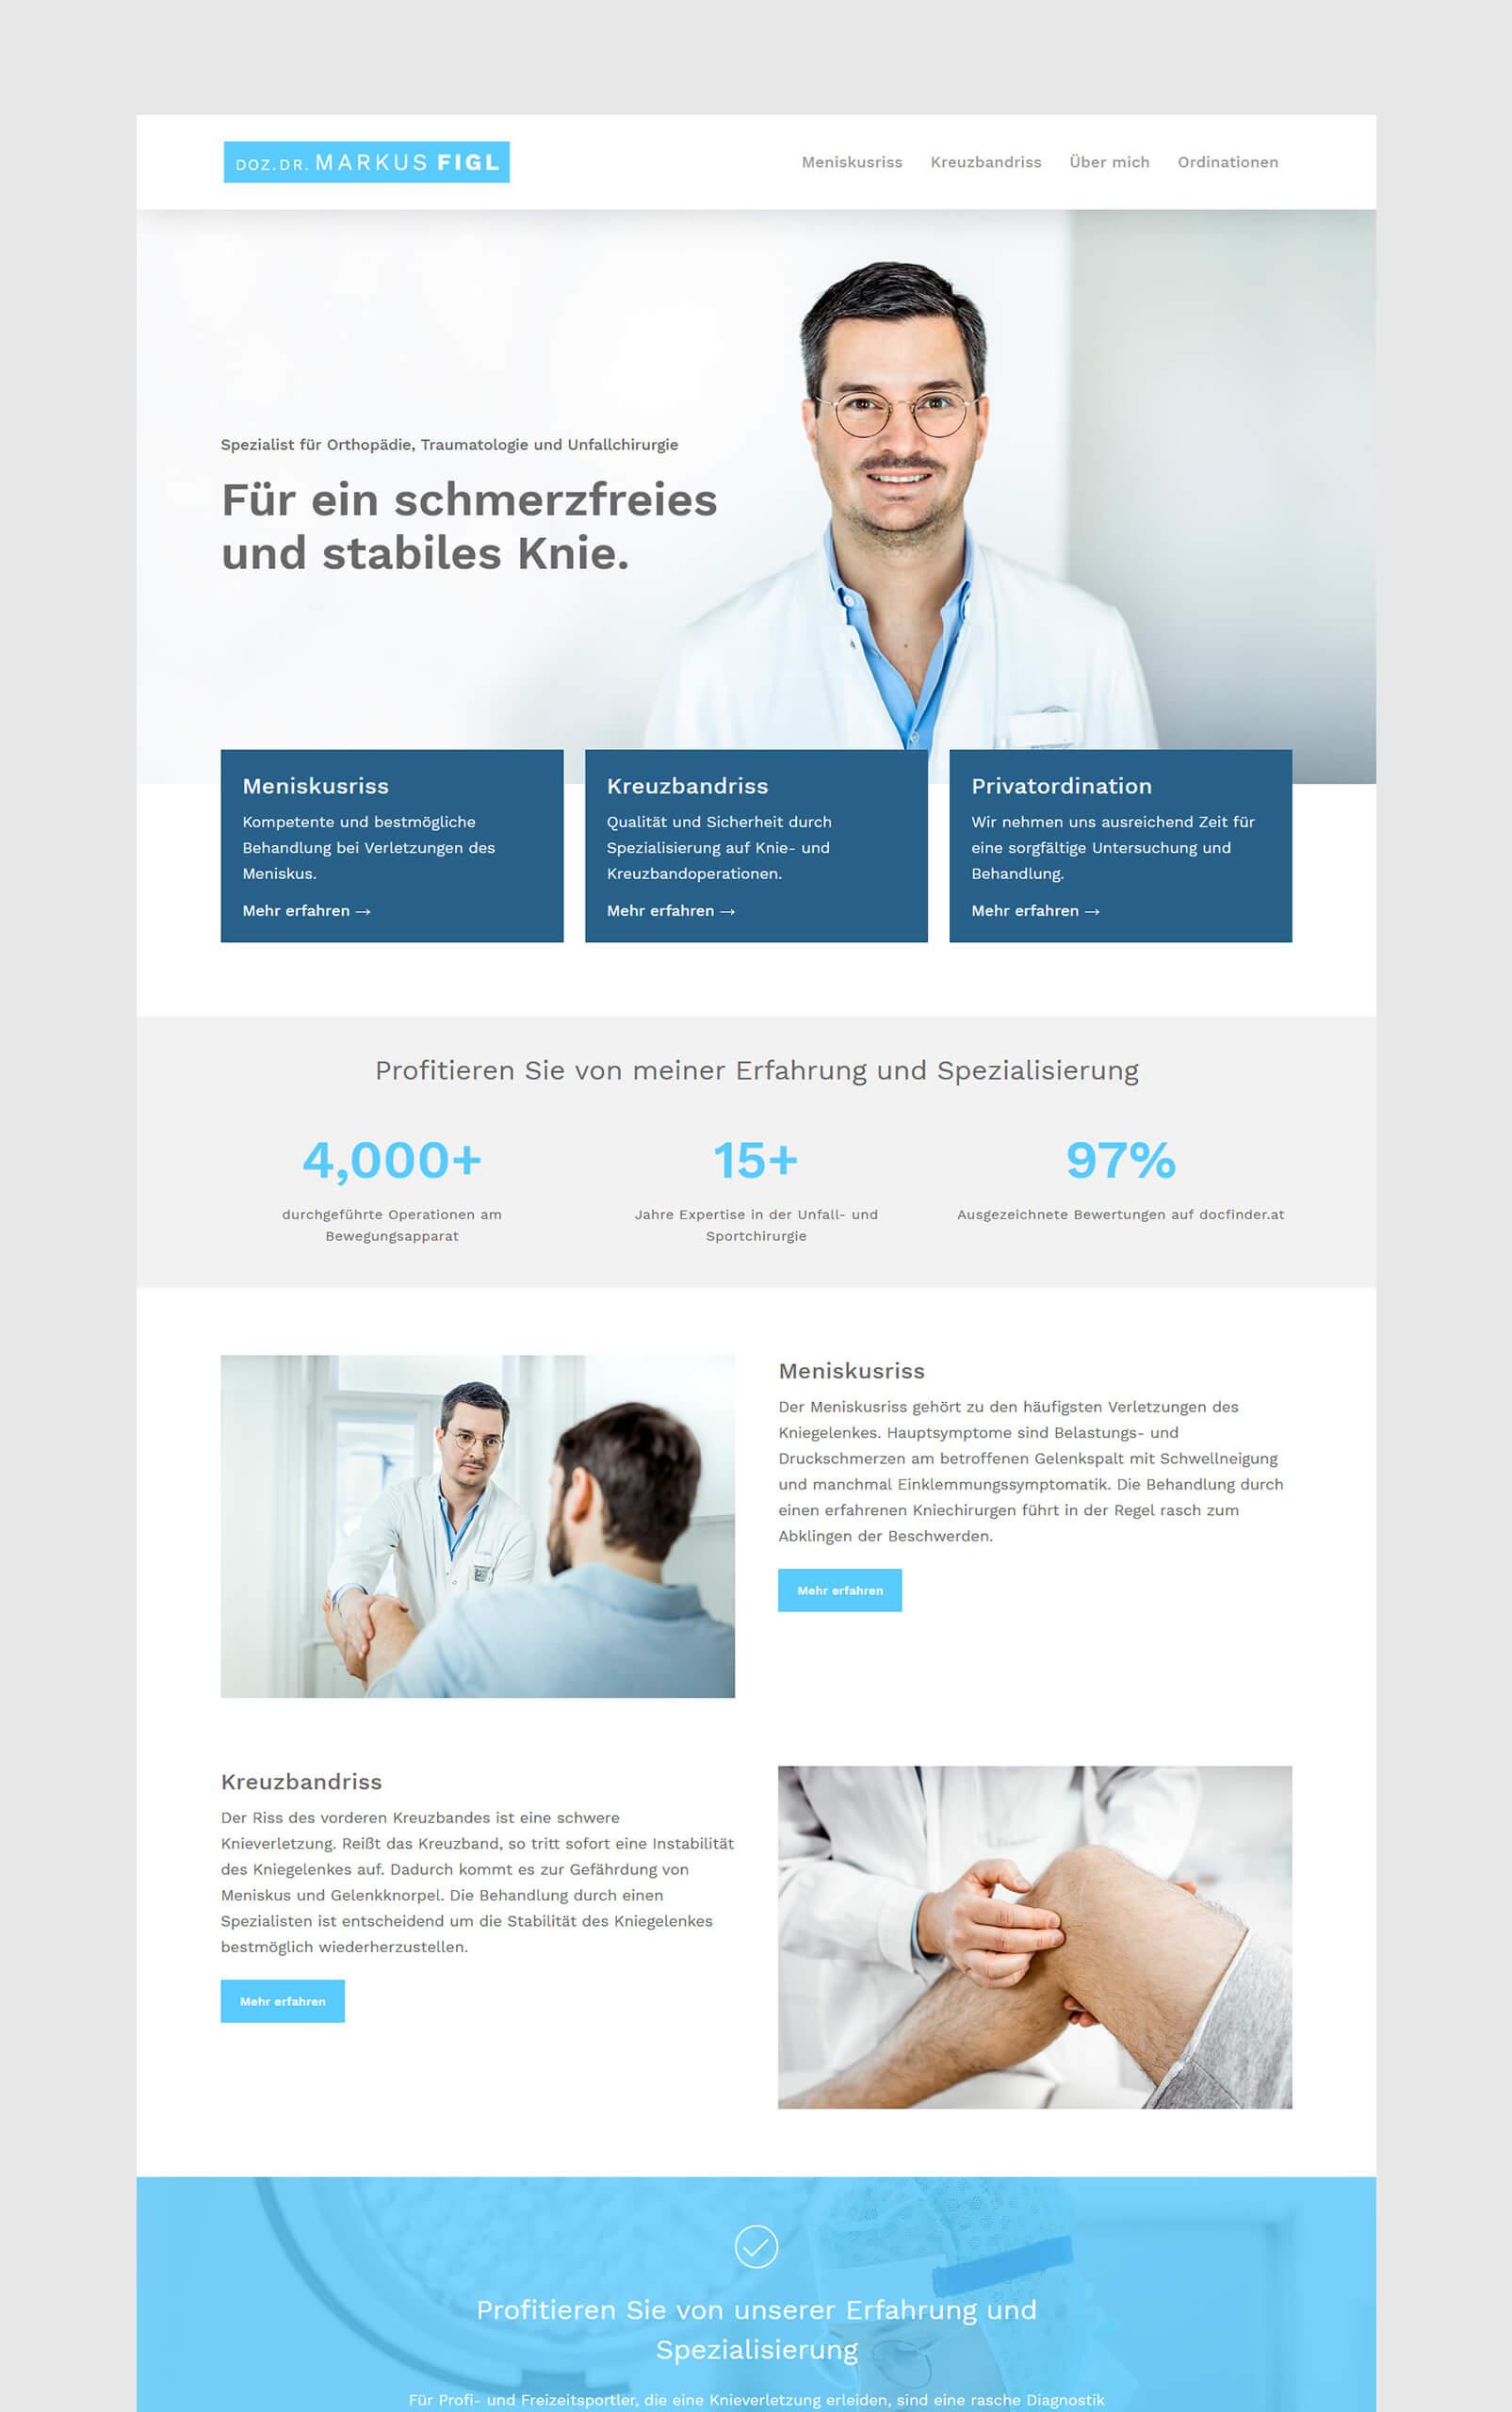 Dr. Figl Website Flat